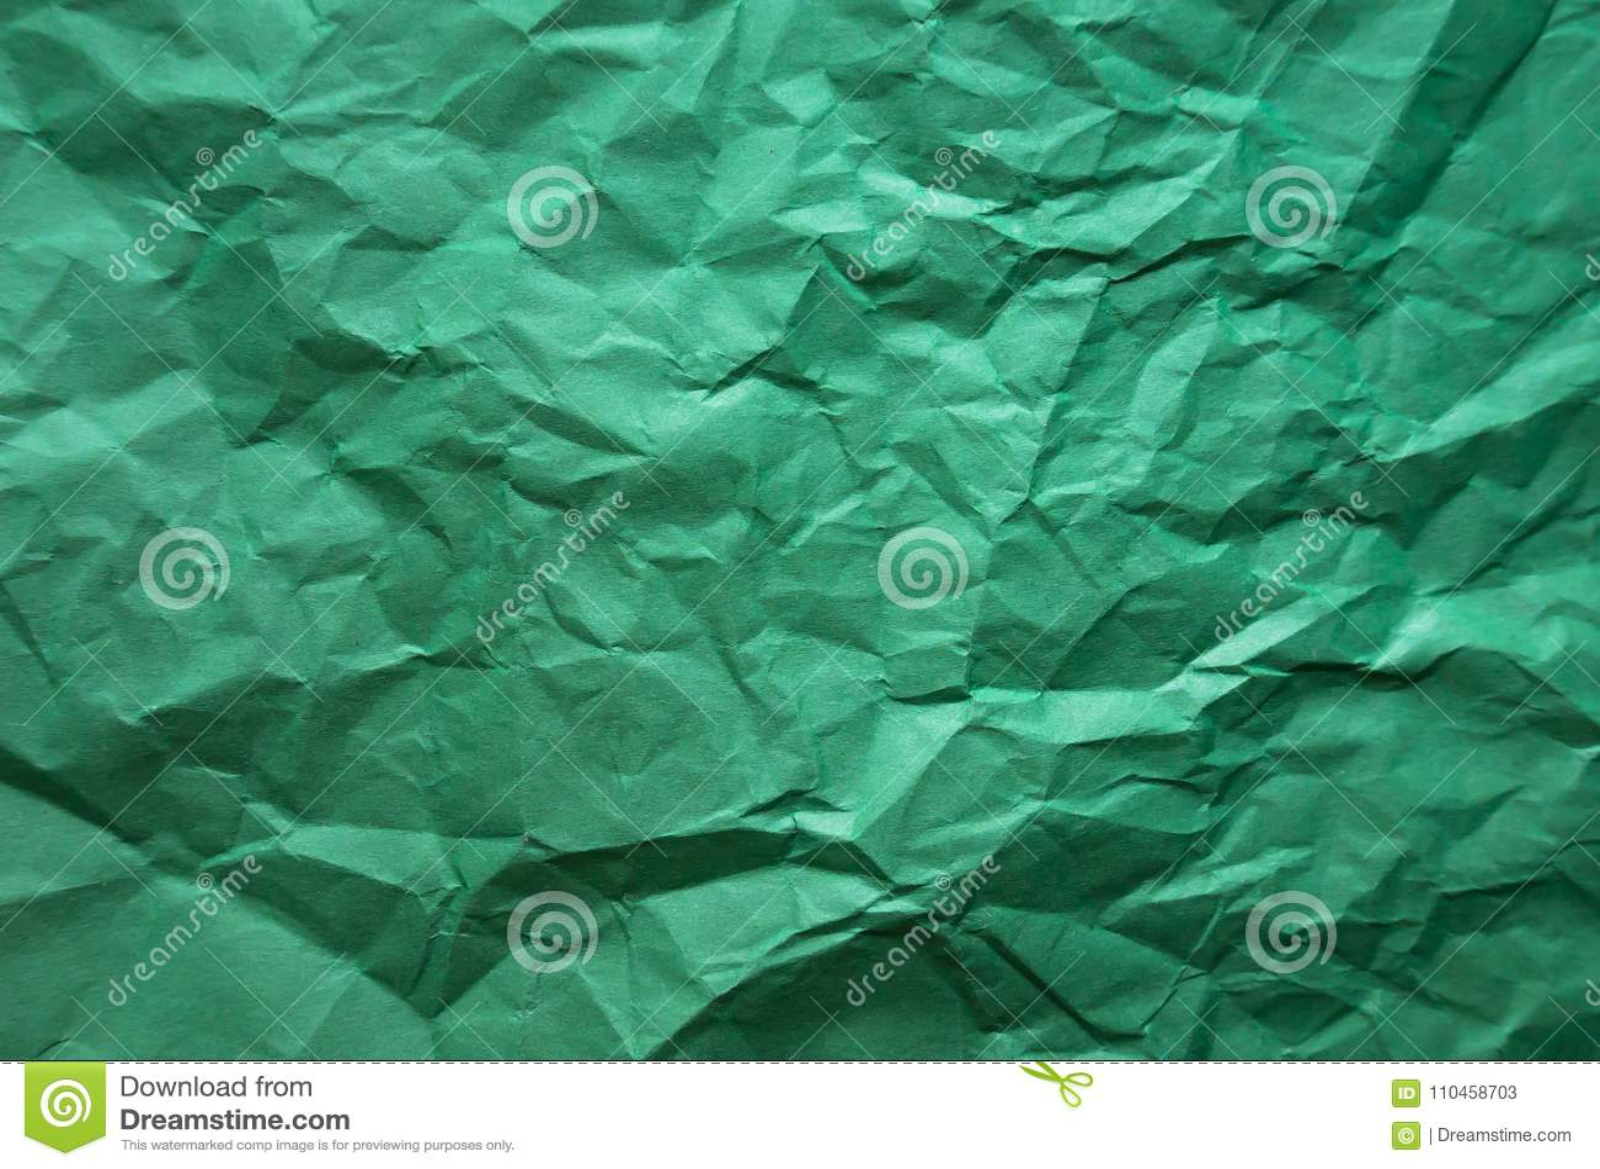 Bakgrund Skrynkligt grönt ark av papper